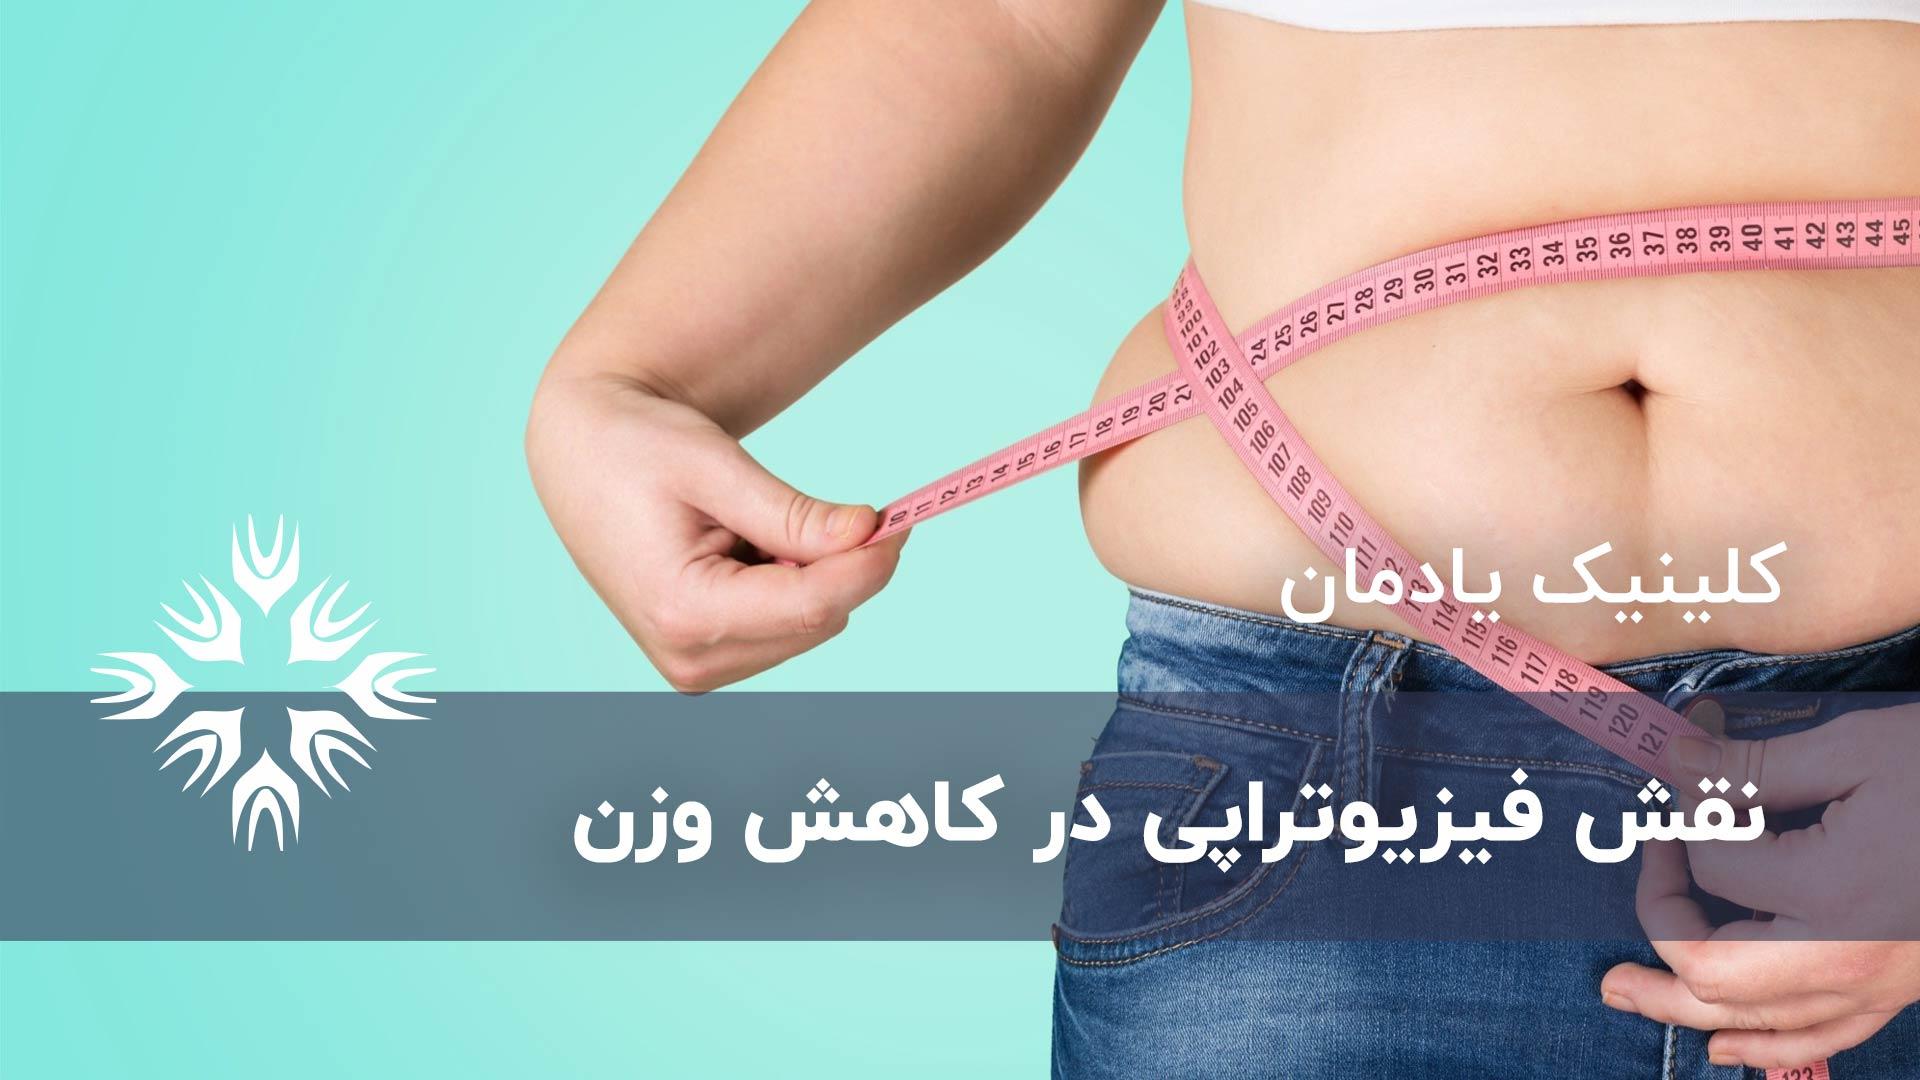 فیزیوتراپی کاهش وزن